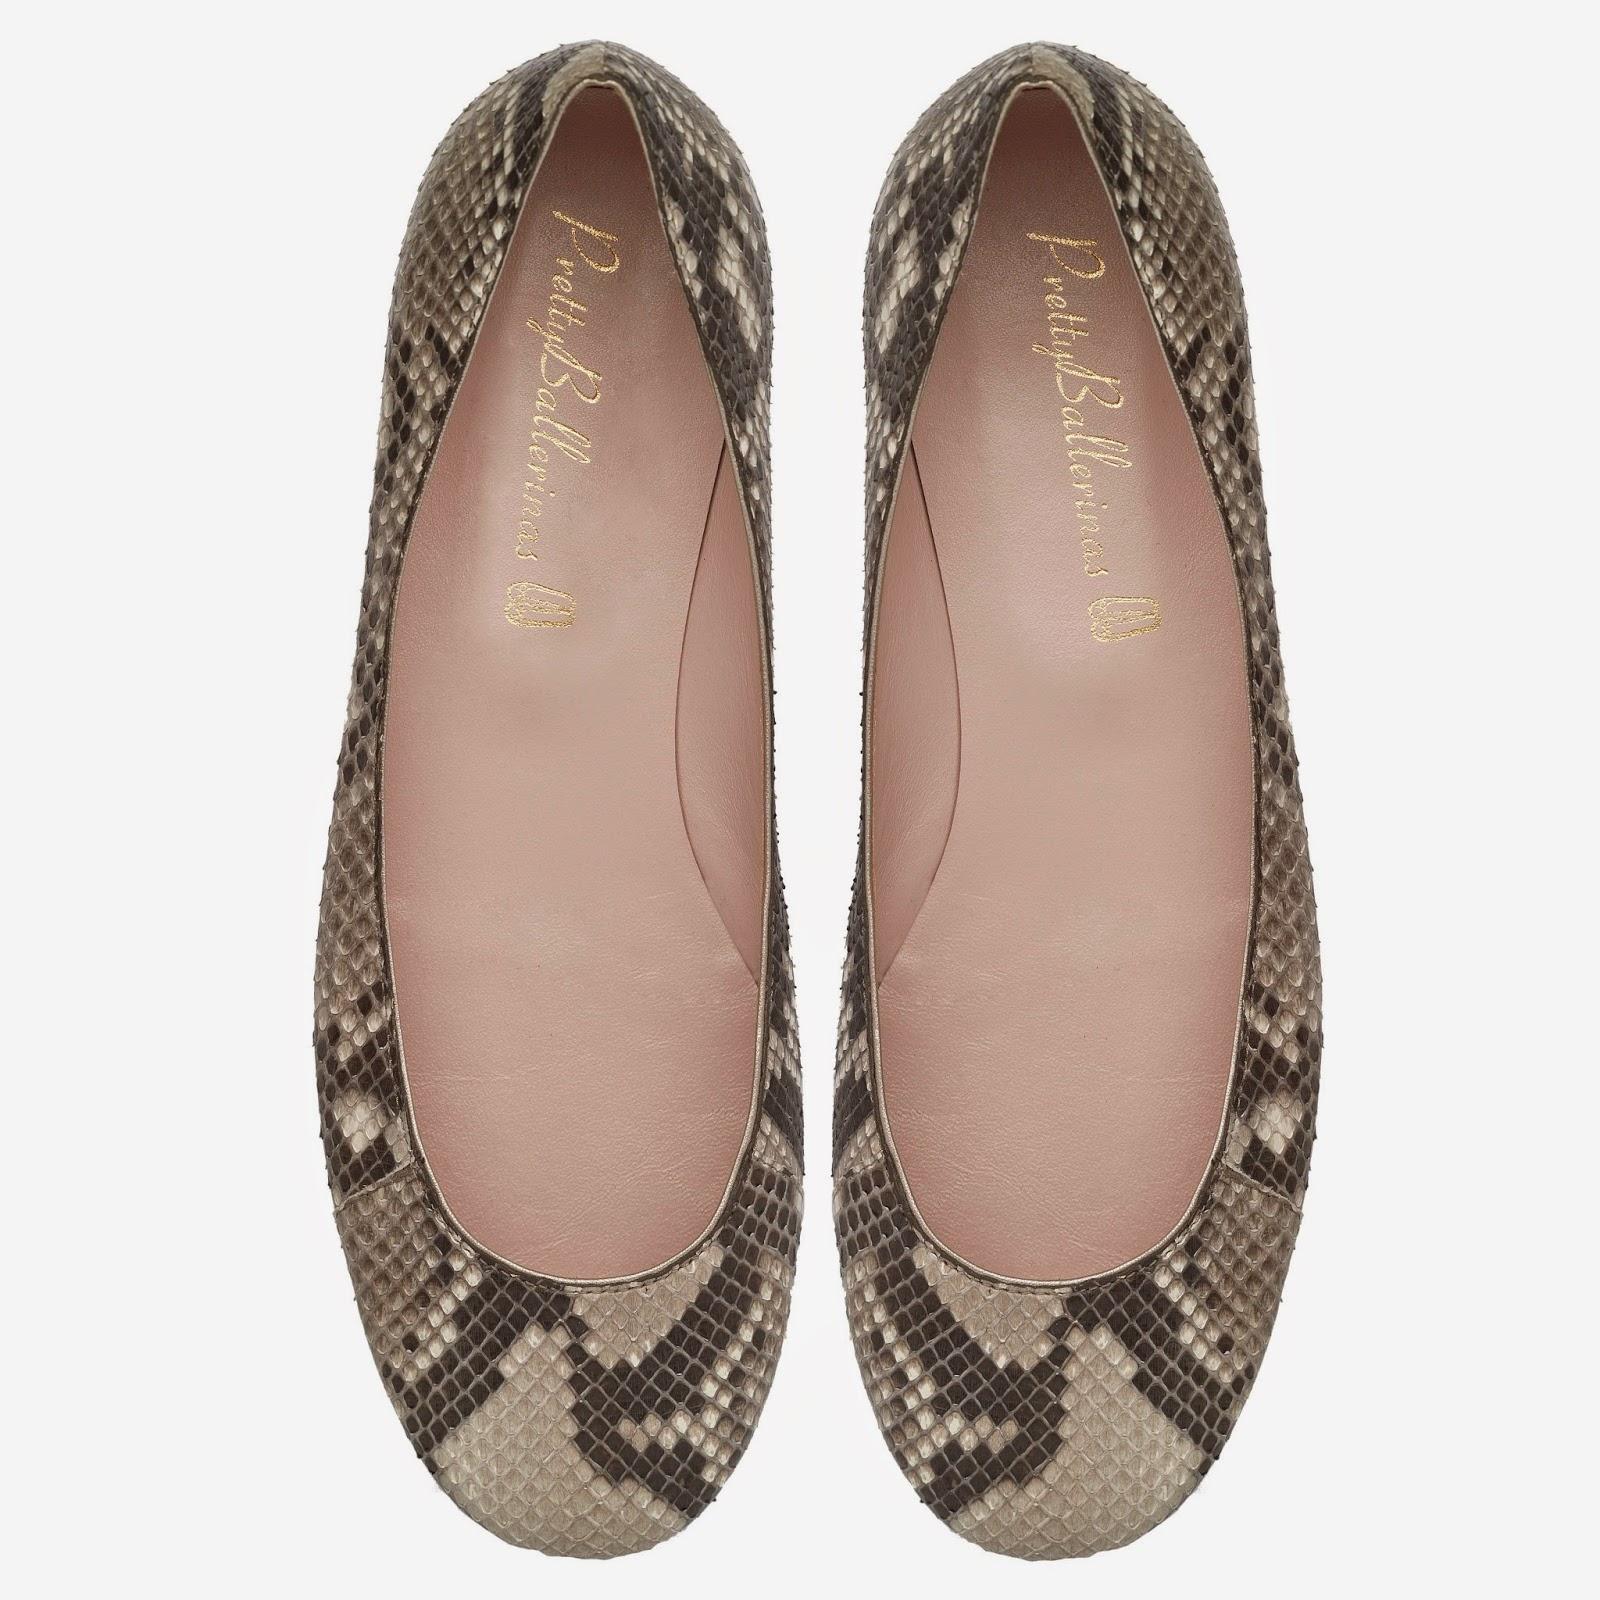 Pretty Ballerinas, Olivia Palermo, Blog de Moda, Pump Snake